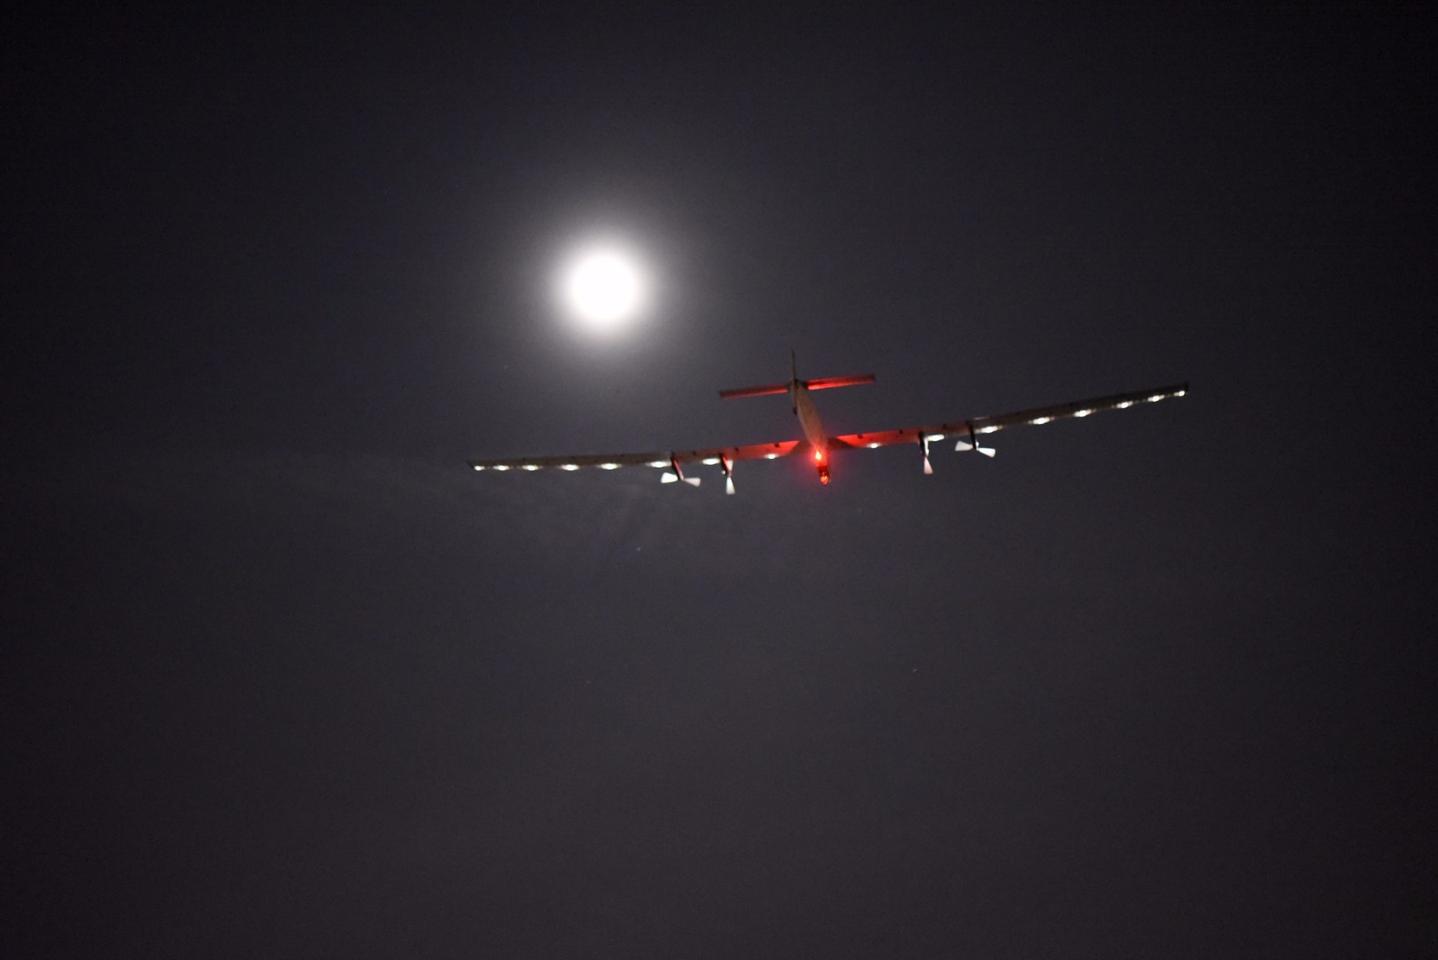 Solar Impulse 2 taking off from Dayton, Ohio